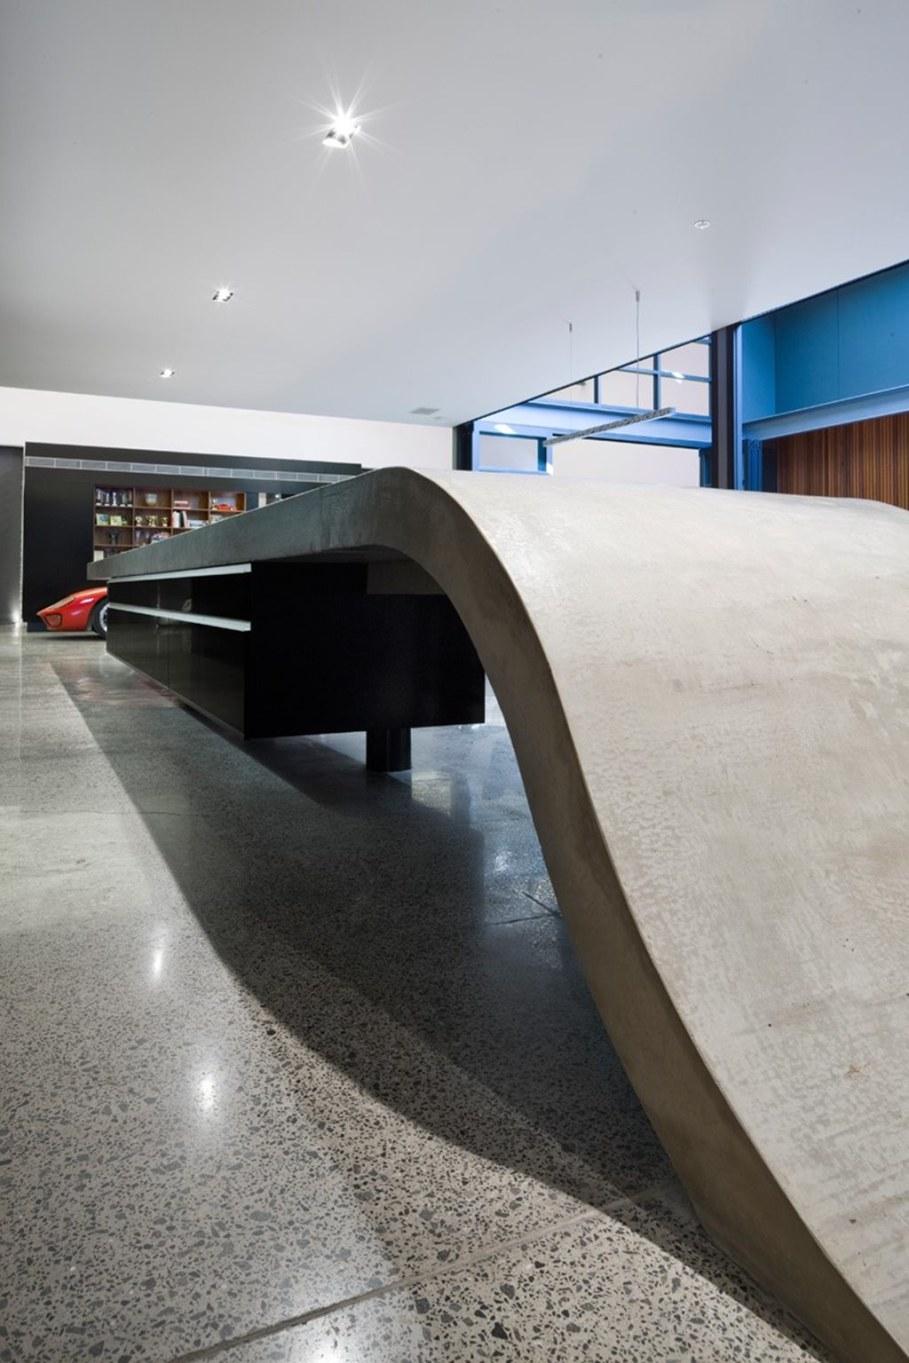 Grand loft house in Australia by Corben Architects studio - Kitchen 4